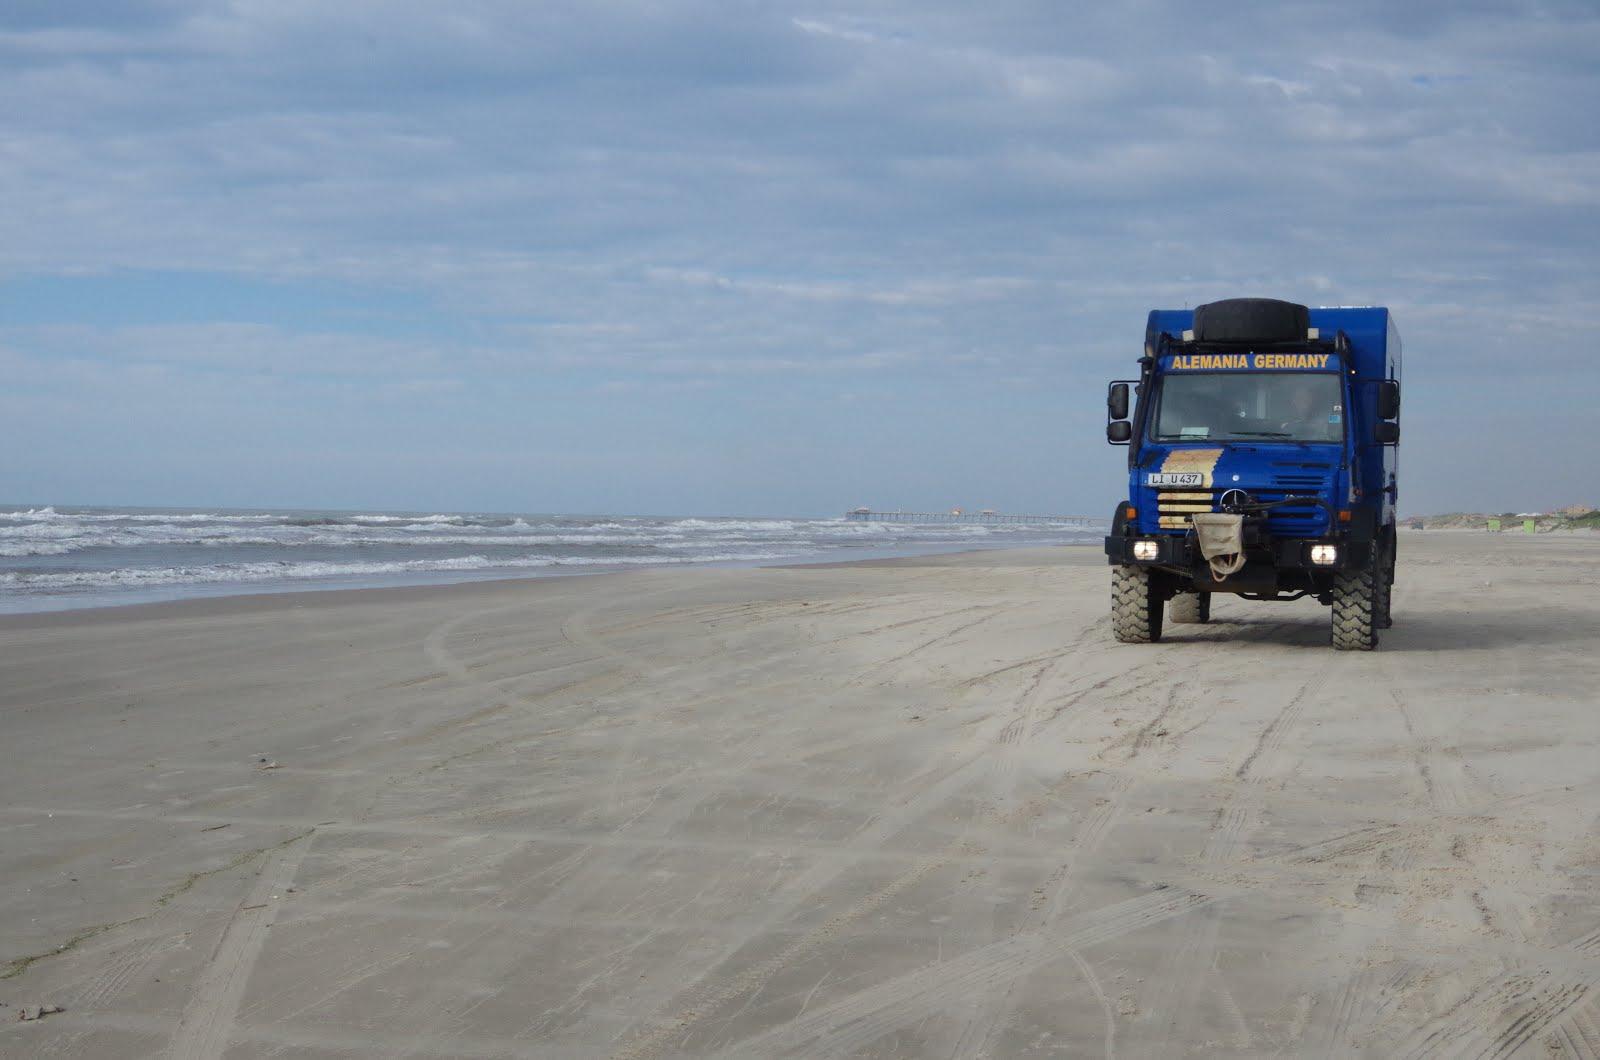 200 km am Strand Richtung Uruguay